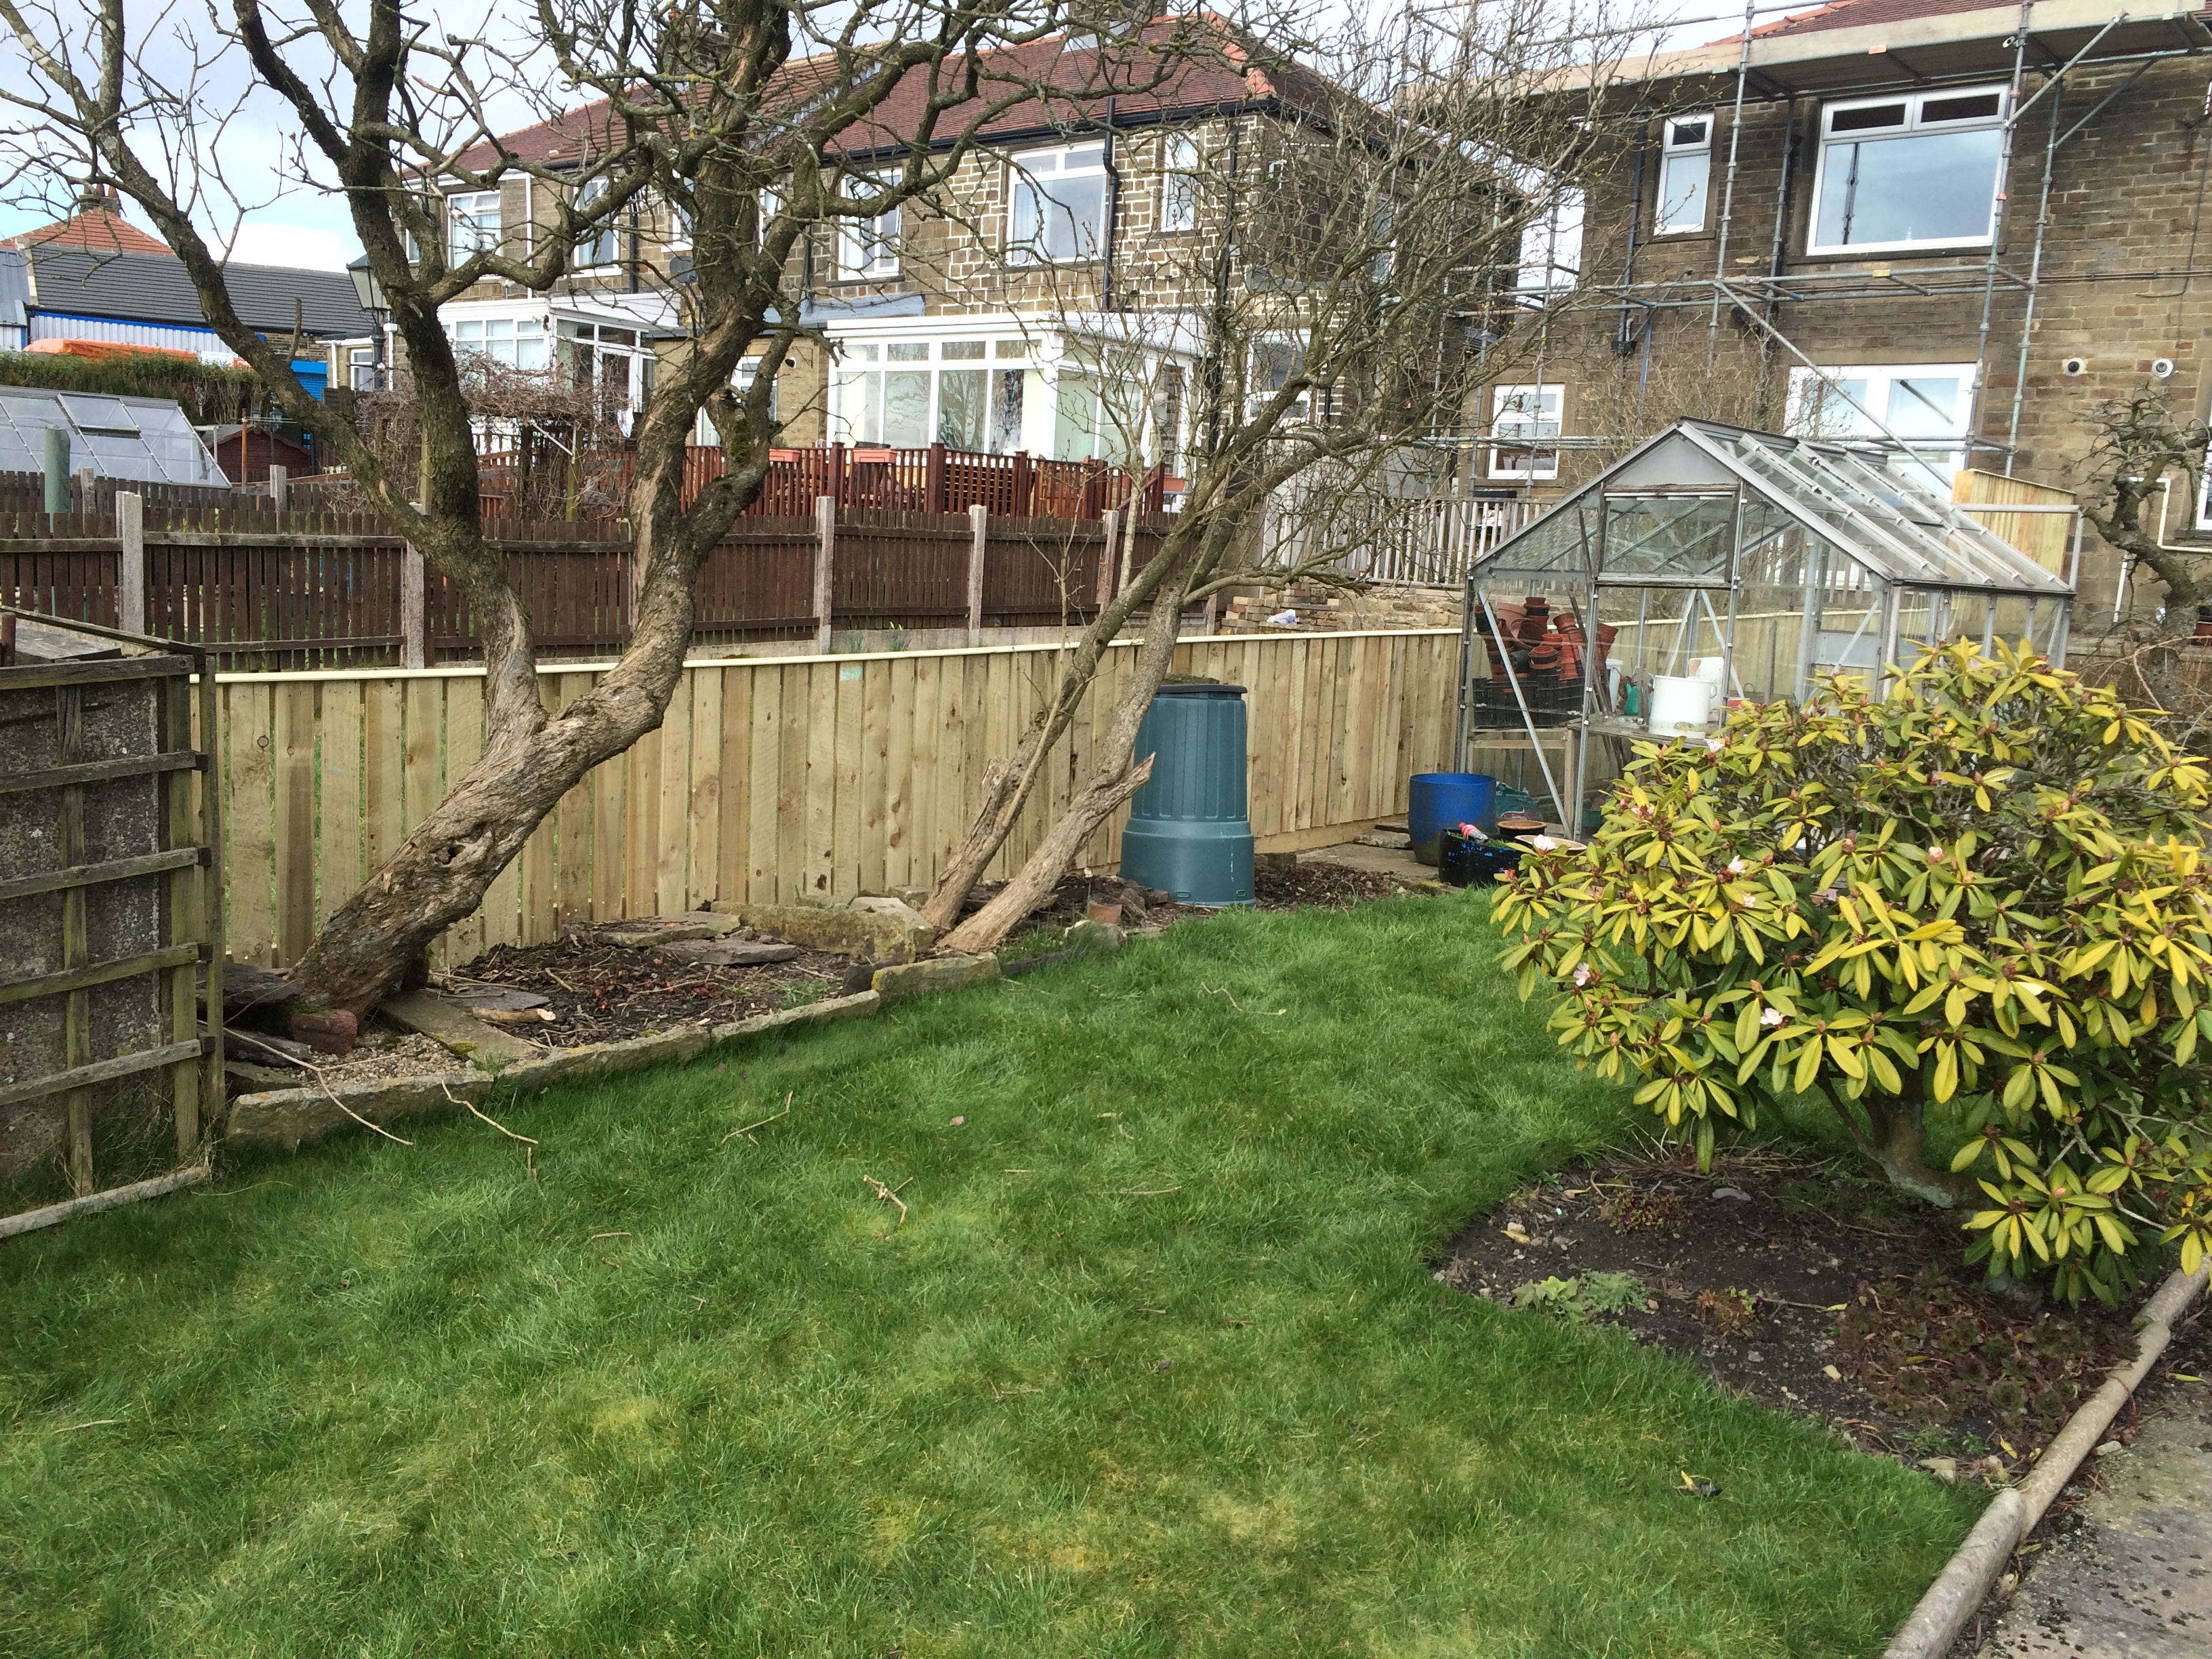 Professional Landscape Gardener In Bradford, West Yorkshire